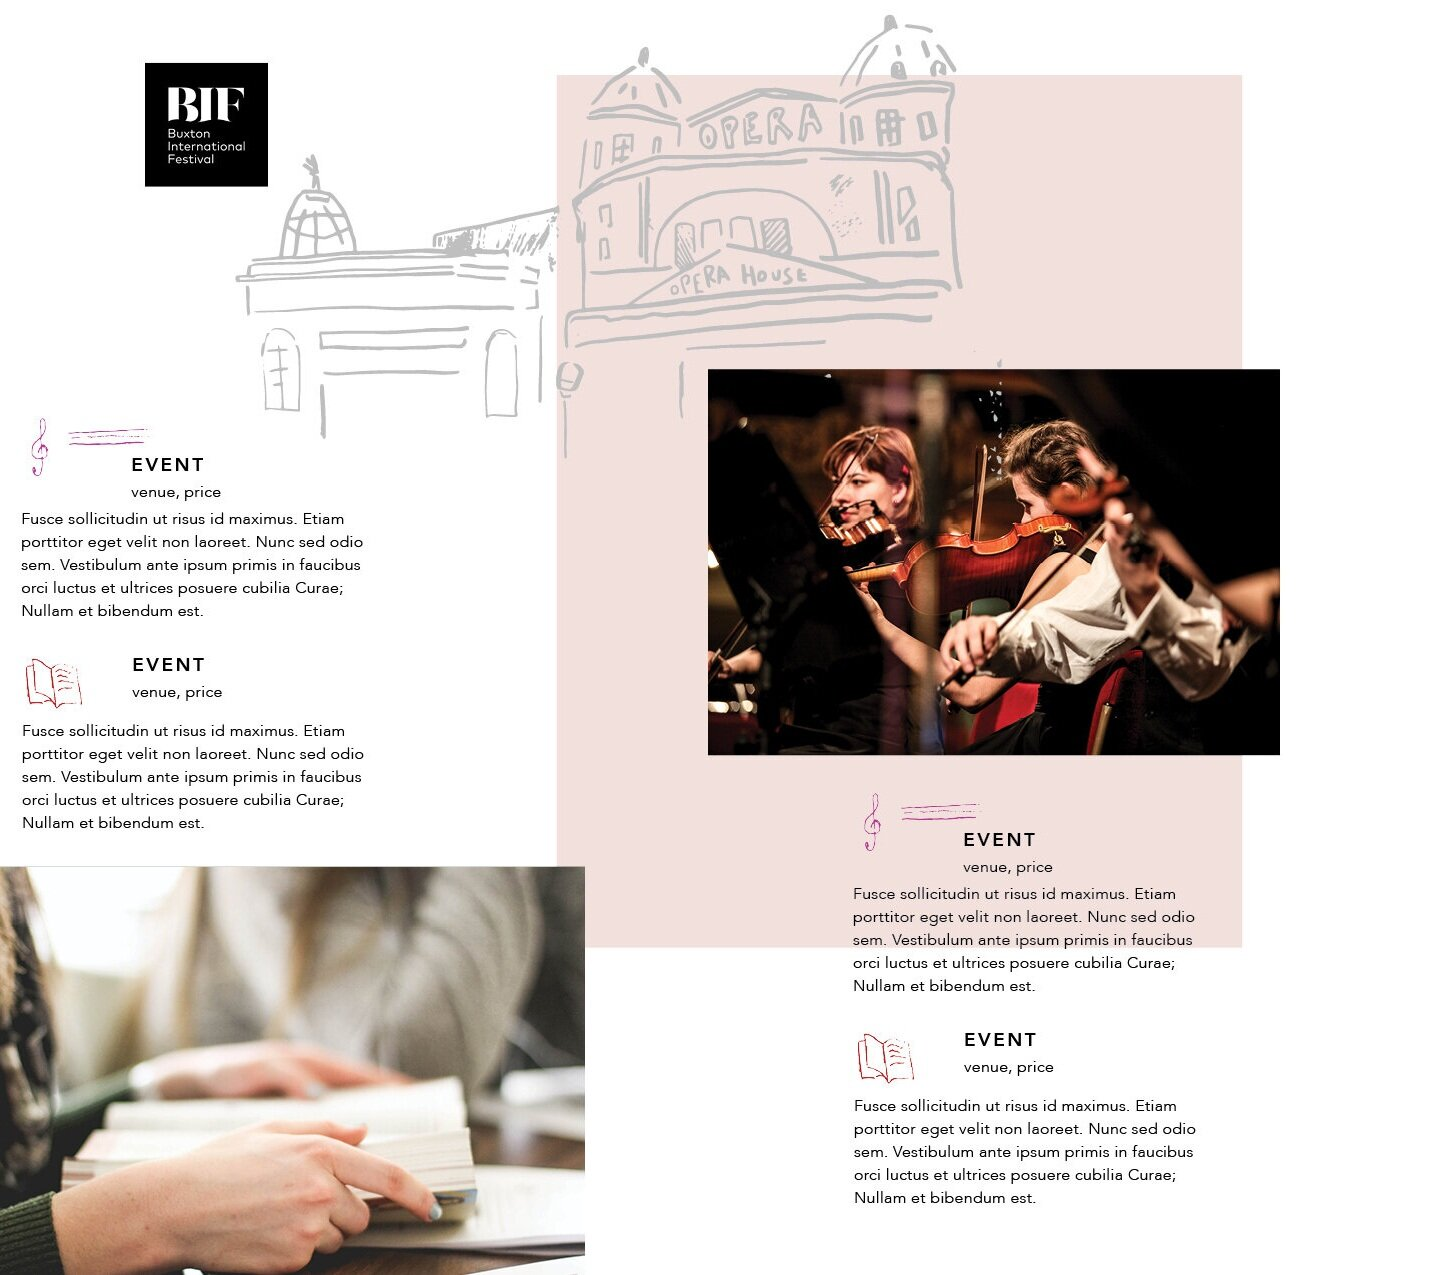 Buxton+International+Festival+Proposal+Lizzie+Quirke+v0.42.jpg